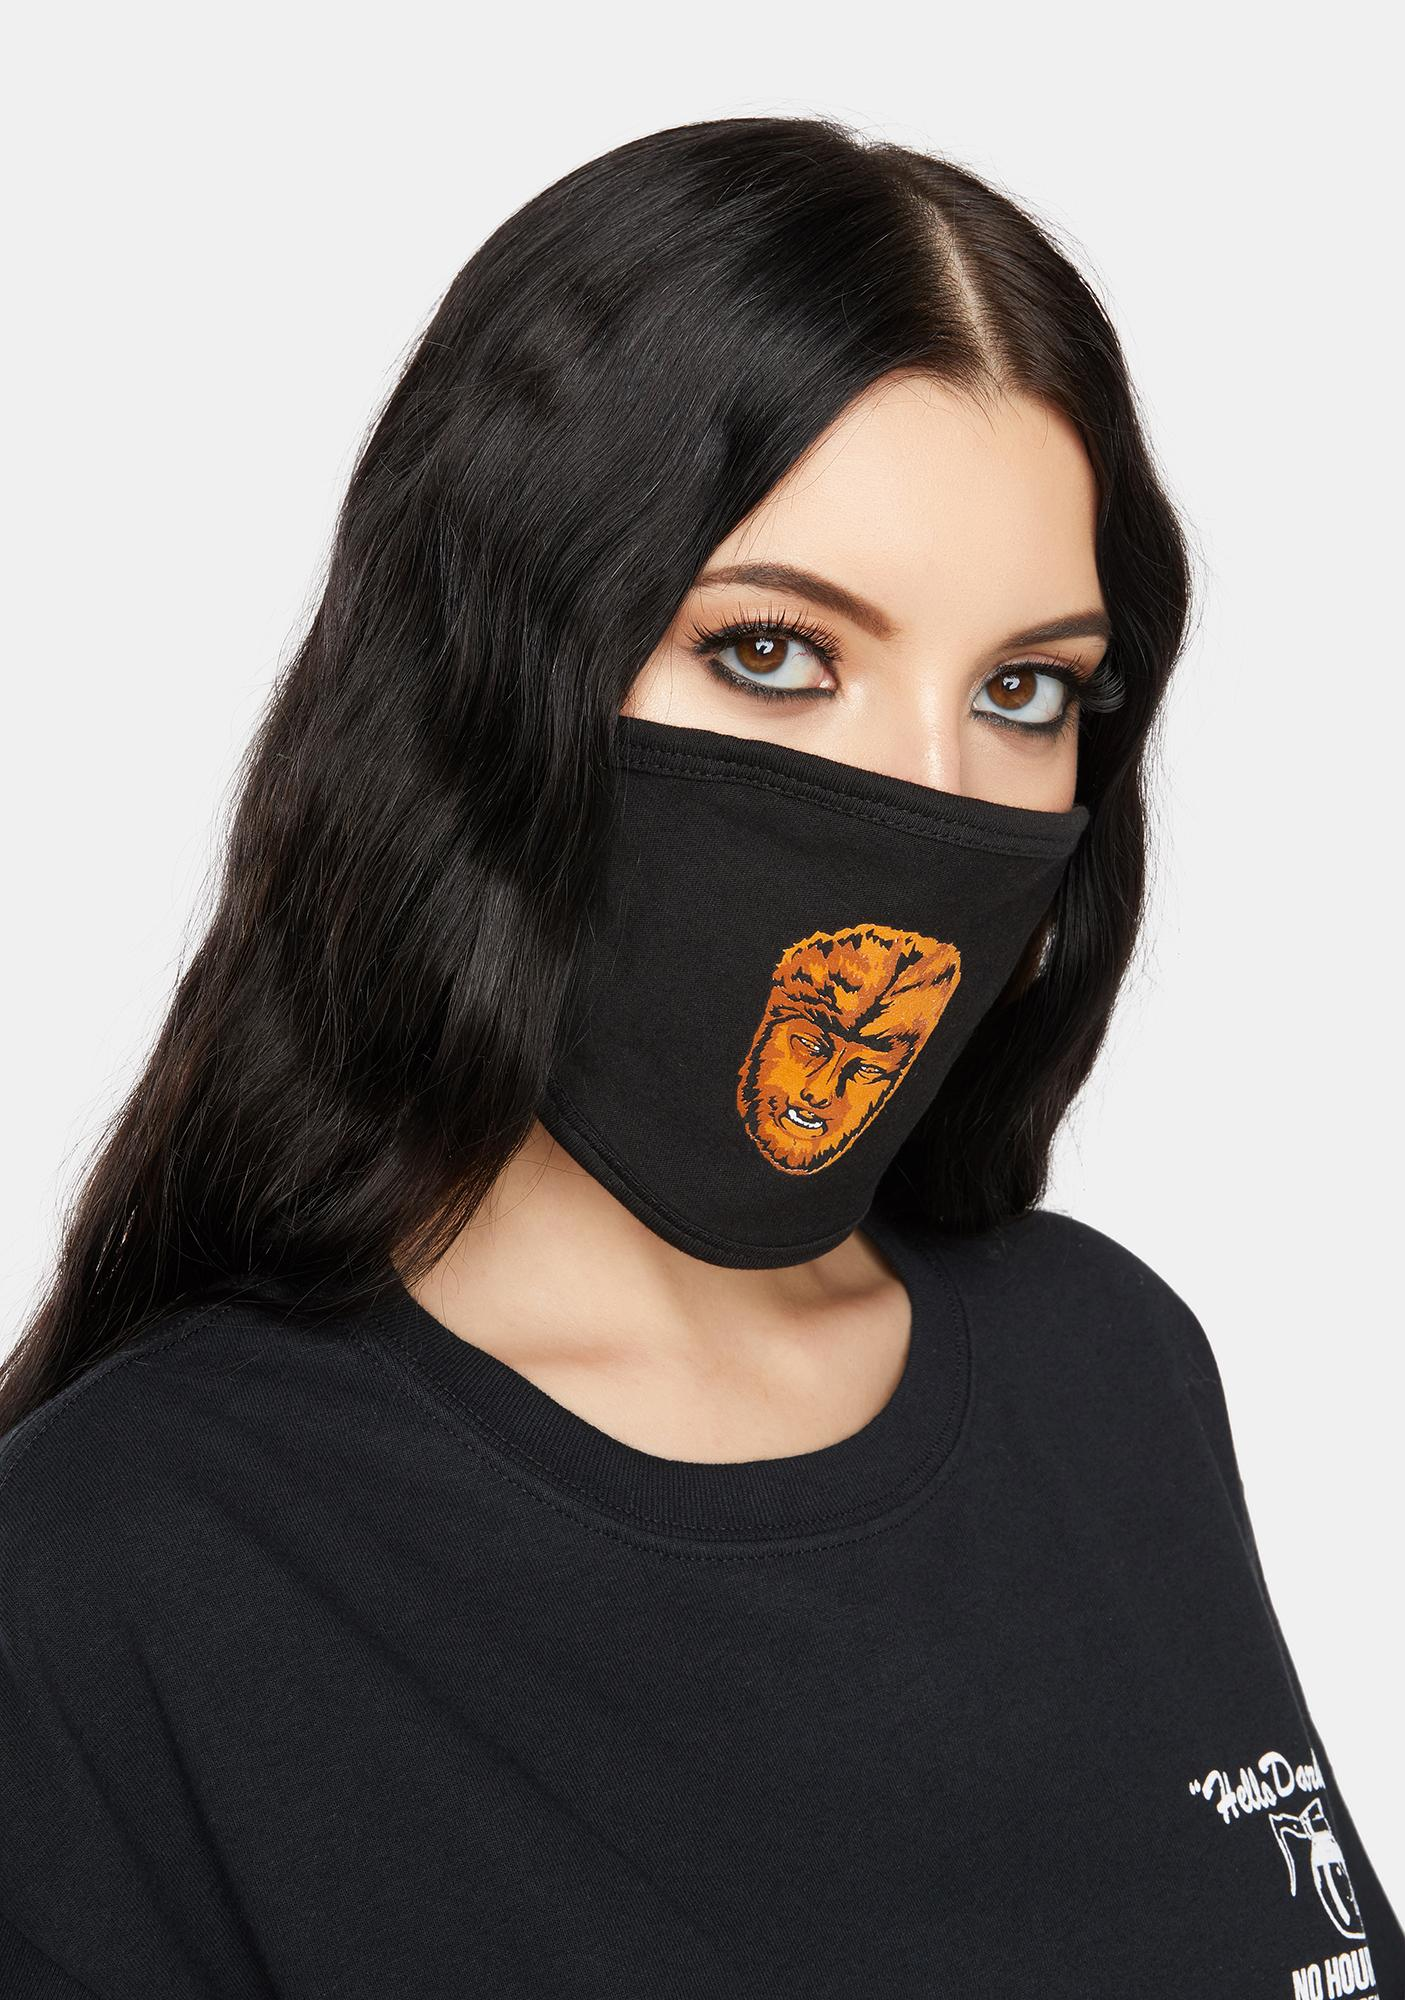 Rock Rebel Chaney Wolfman Face Mask